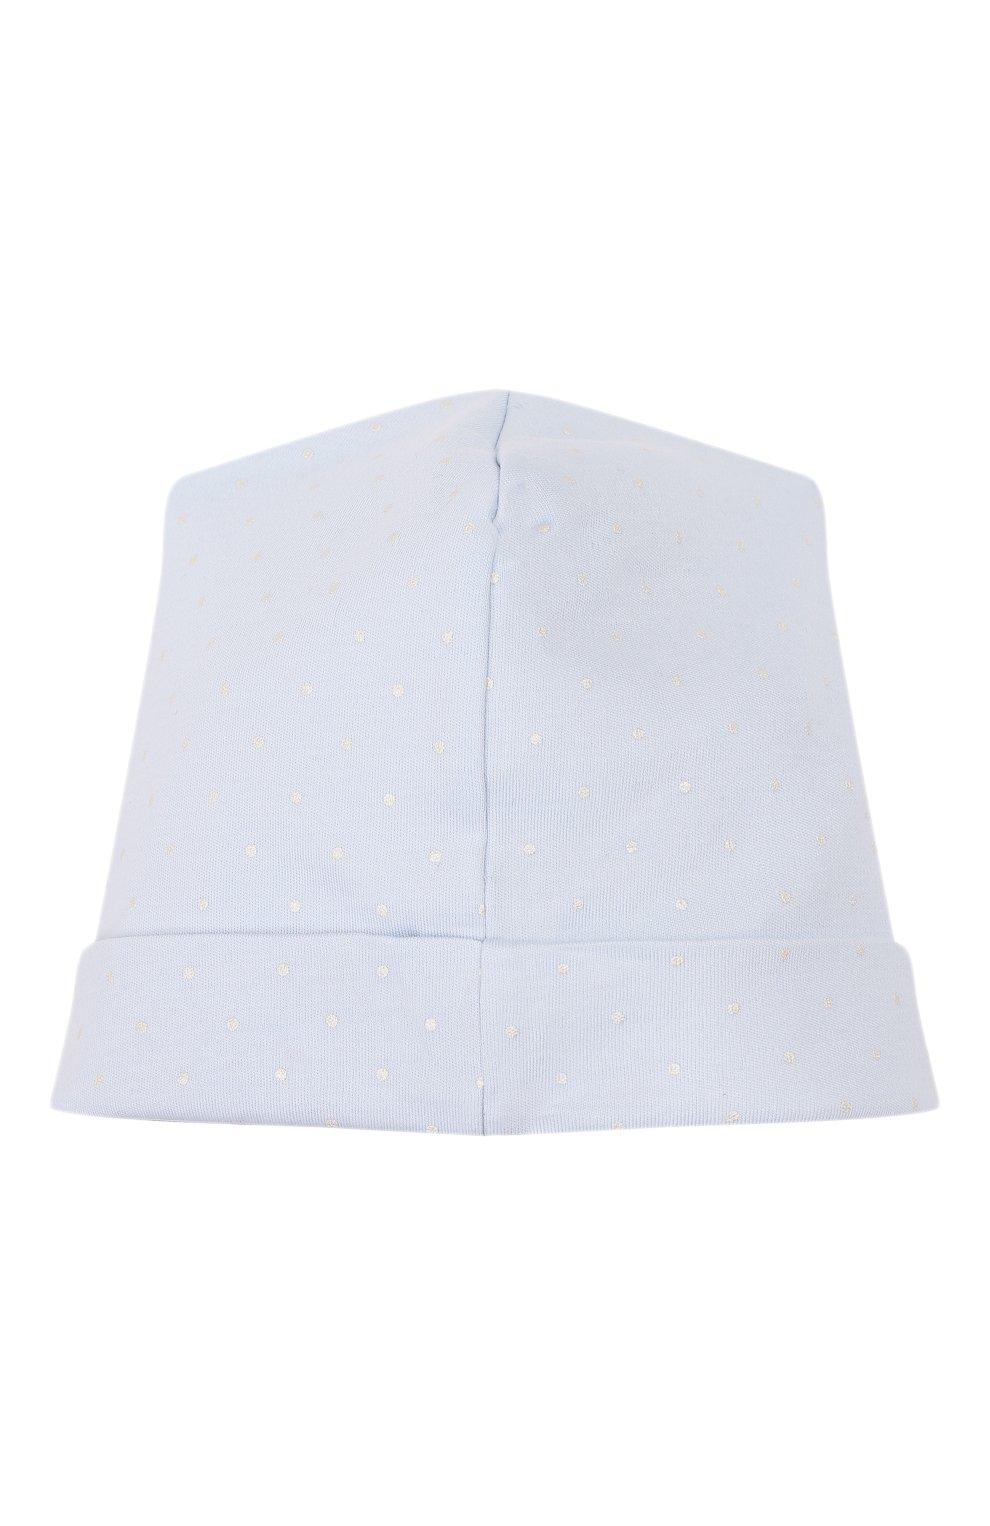 Детского шапка noah's friends MAGNOLIA BABY синего цвета, арт. E109-50P-LB | Фото 2 (Материал: Текстиль, Хлопок; Кросс-КТ НВ: Шапочки-аксессуары)